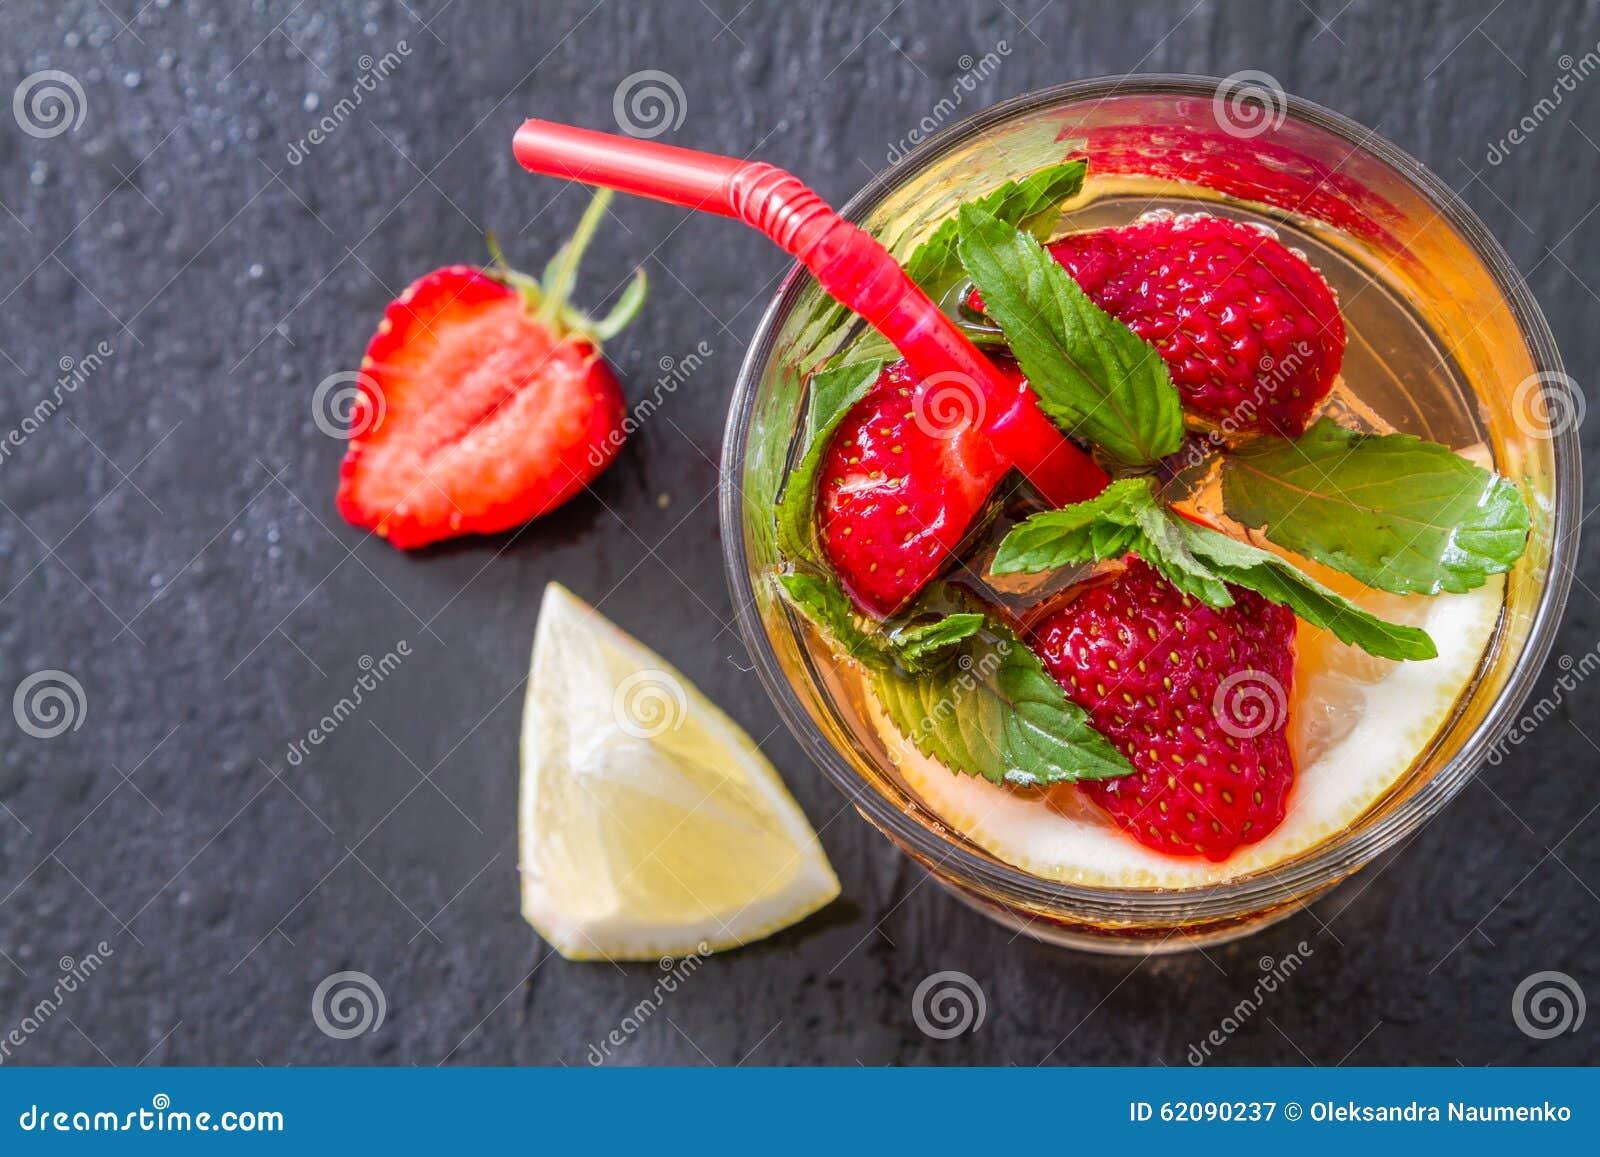 Ingredientes de la limonada de la fresa con la menta fondo de piedra oscuro foto de archivo - Fresas para piedra ...